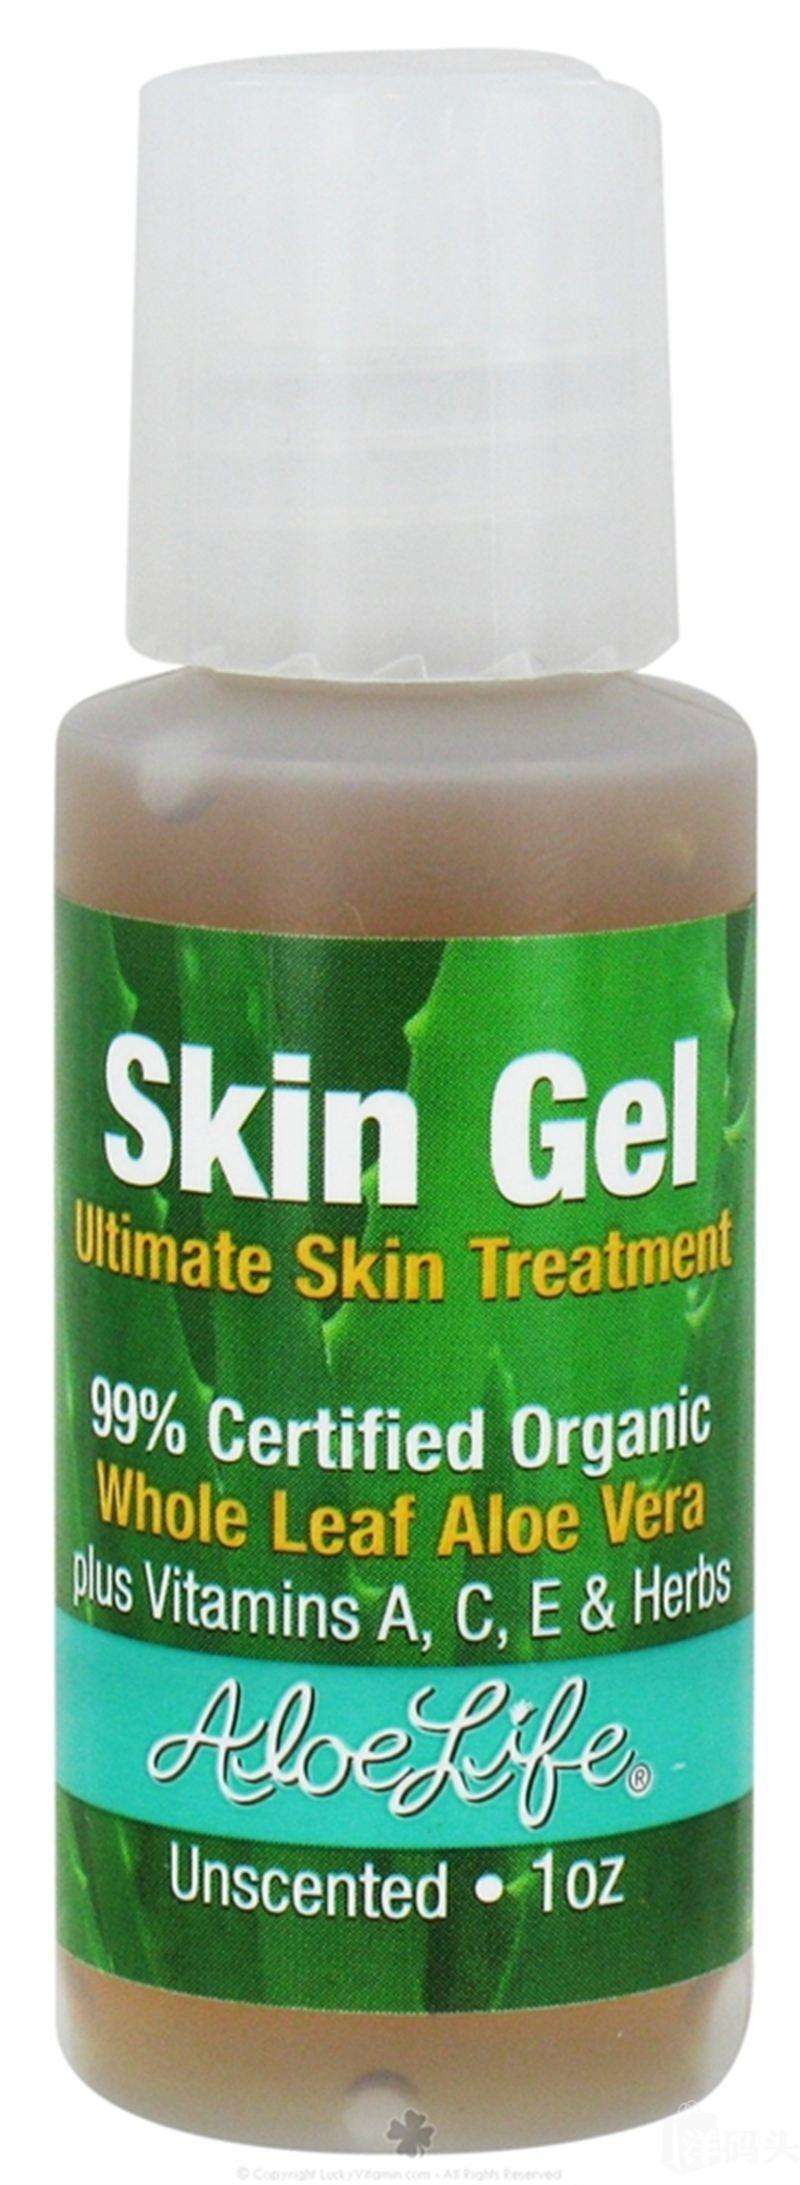 Aloelife Skin Gel 芦荟凝胶 (29ml)